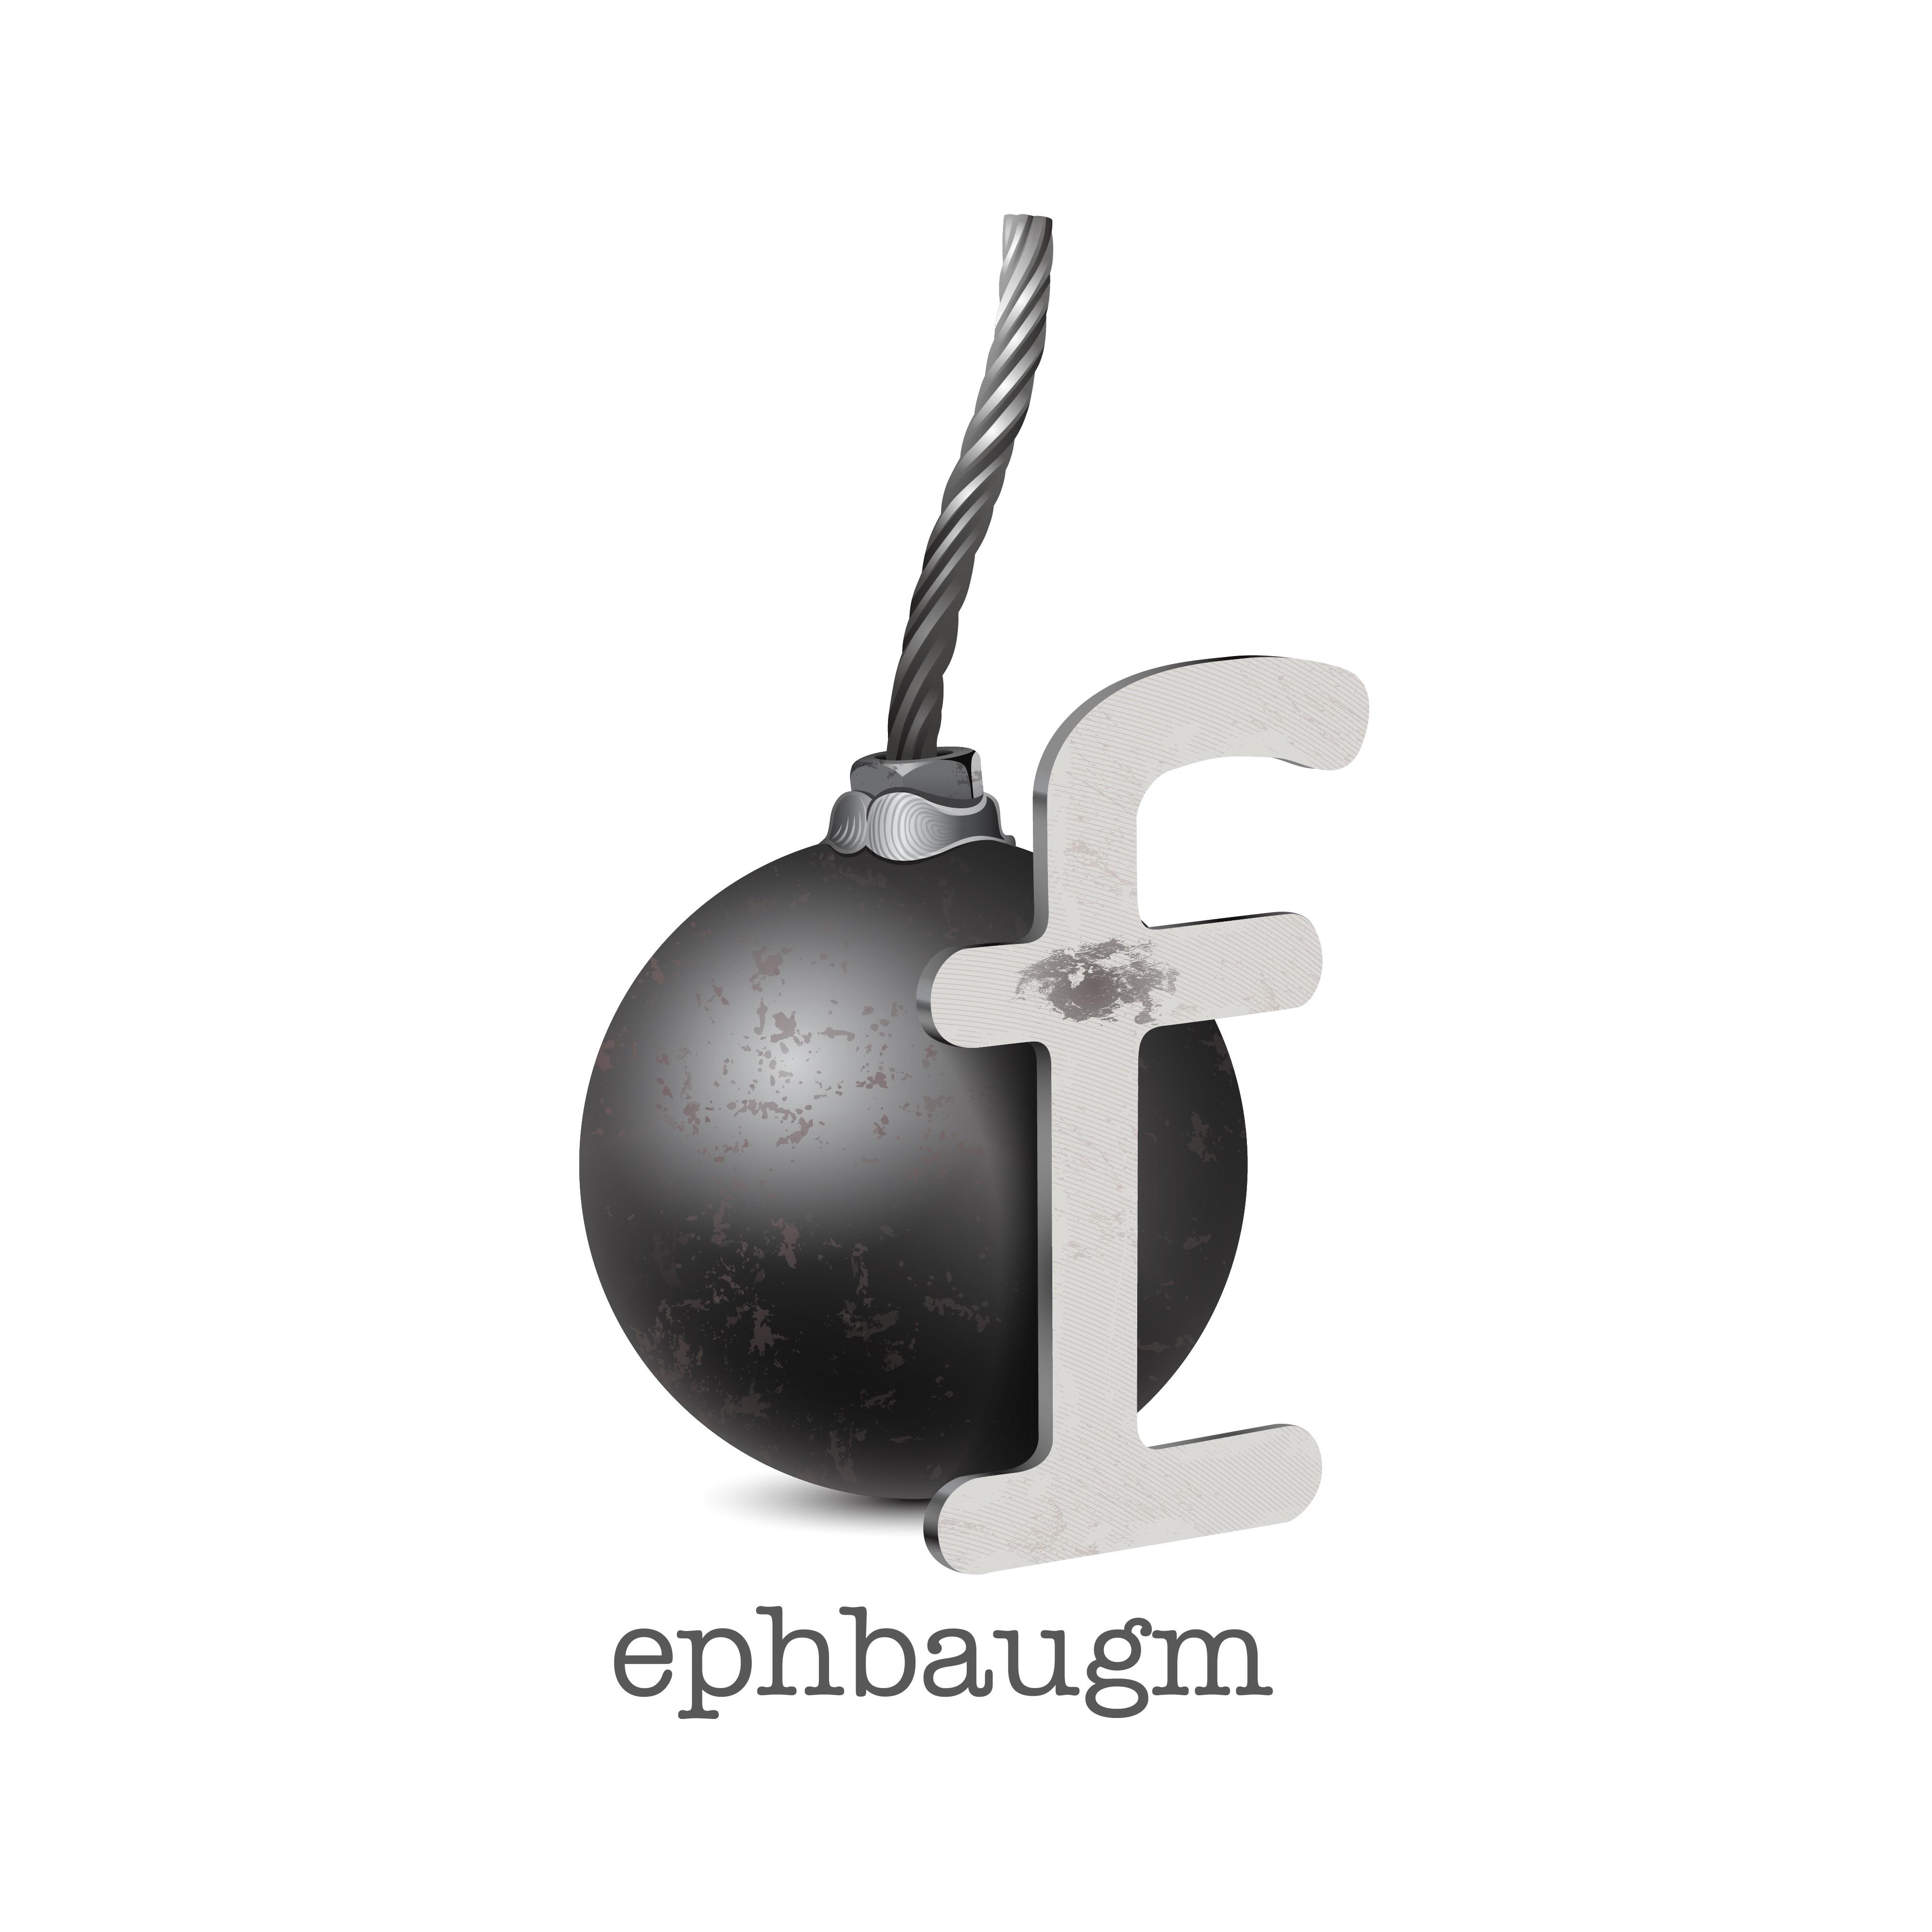 Ephbaugm Soap Company Seeks Design with Humorous Undertone - Have Some Fun!